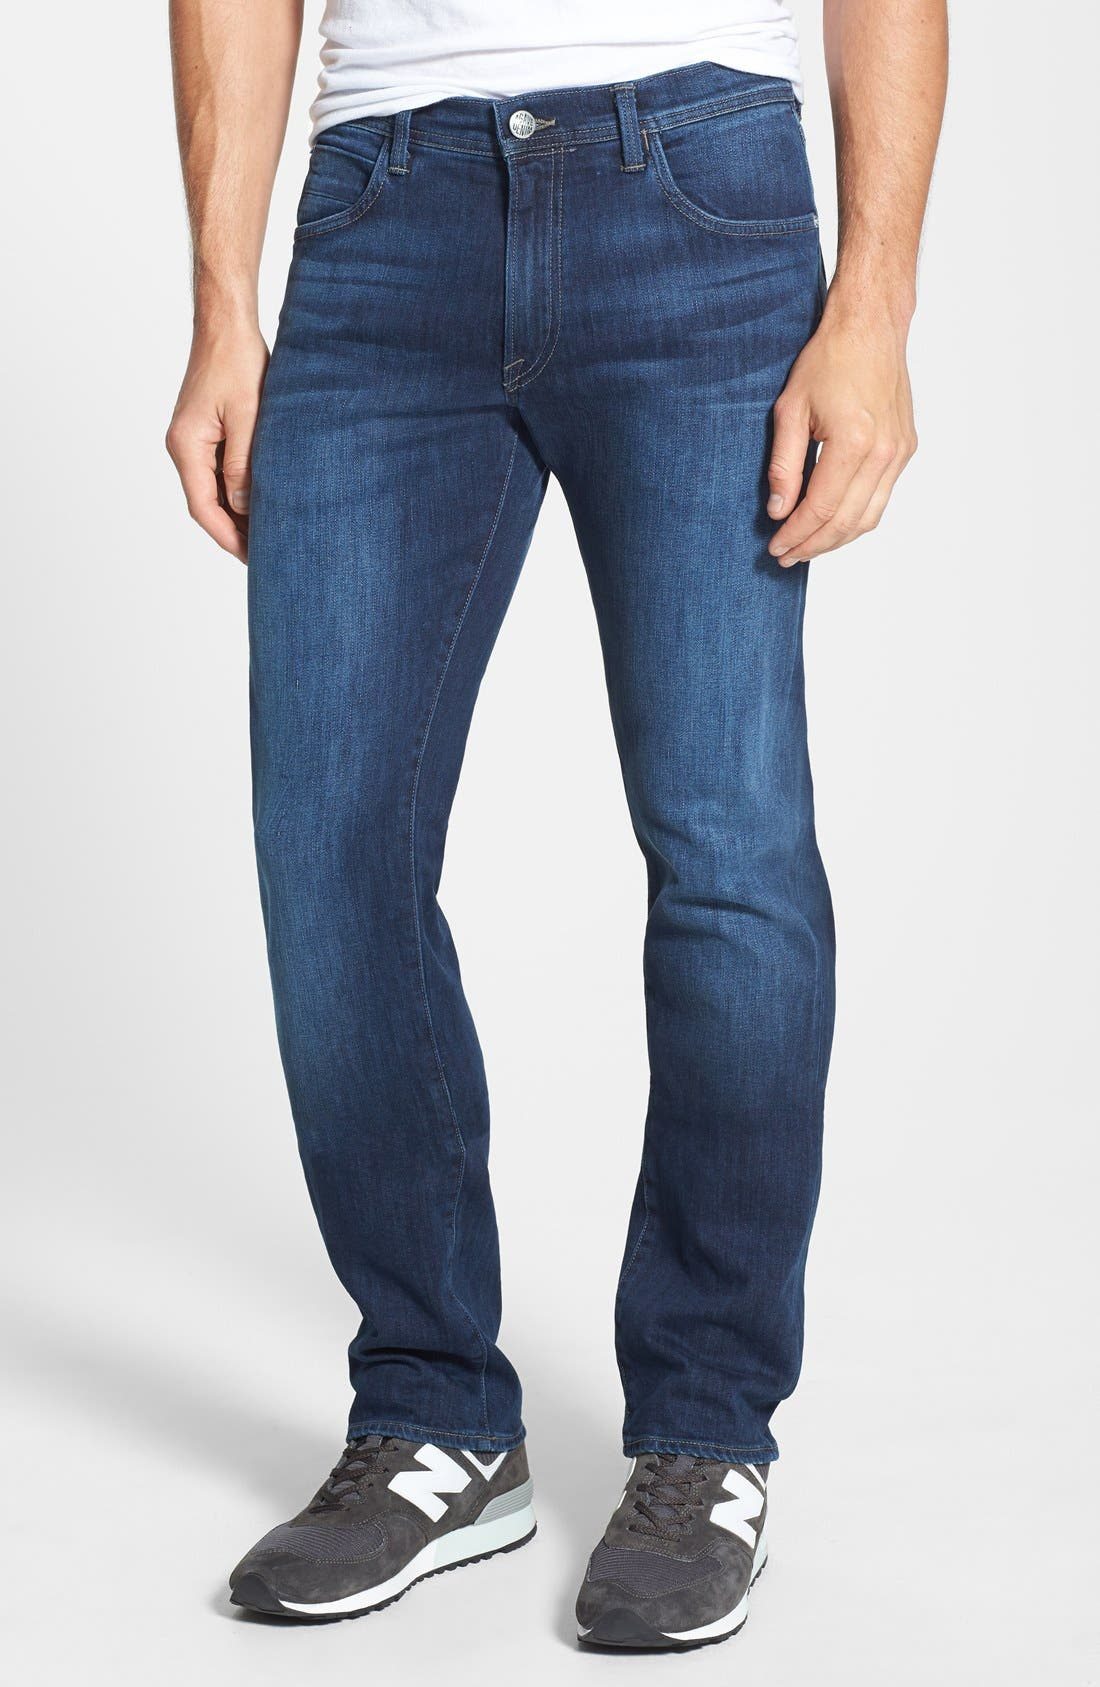 'Pragmatist Big Drake 4 Year Flex' Straight Leg Italian Stretch Denim Jeans,                             Main thumbnail 1, color,                             421